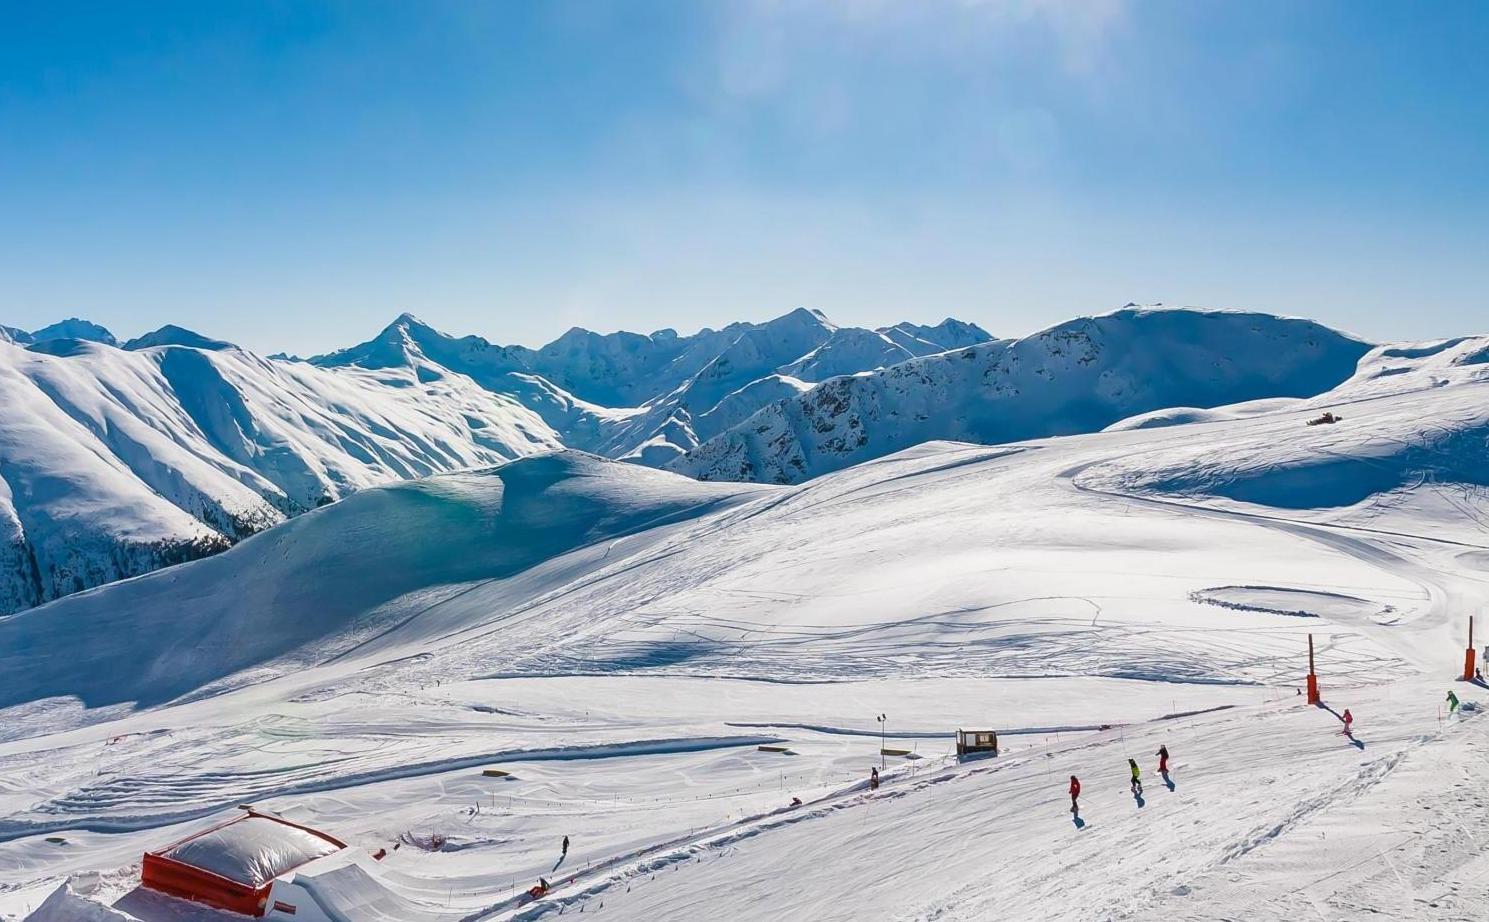 Ski Resort Livigno